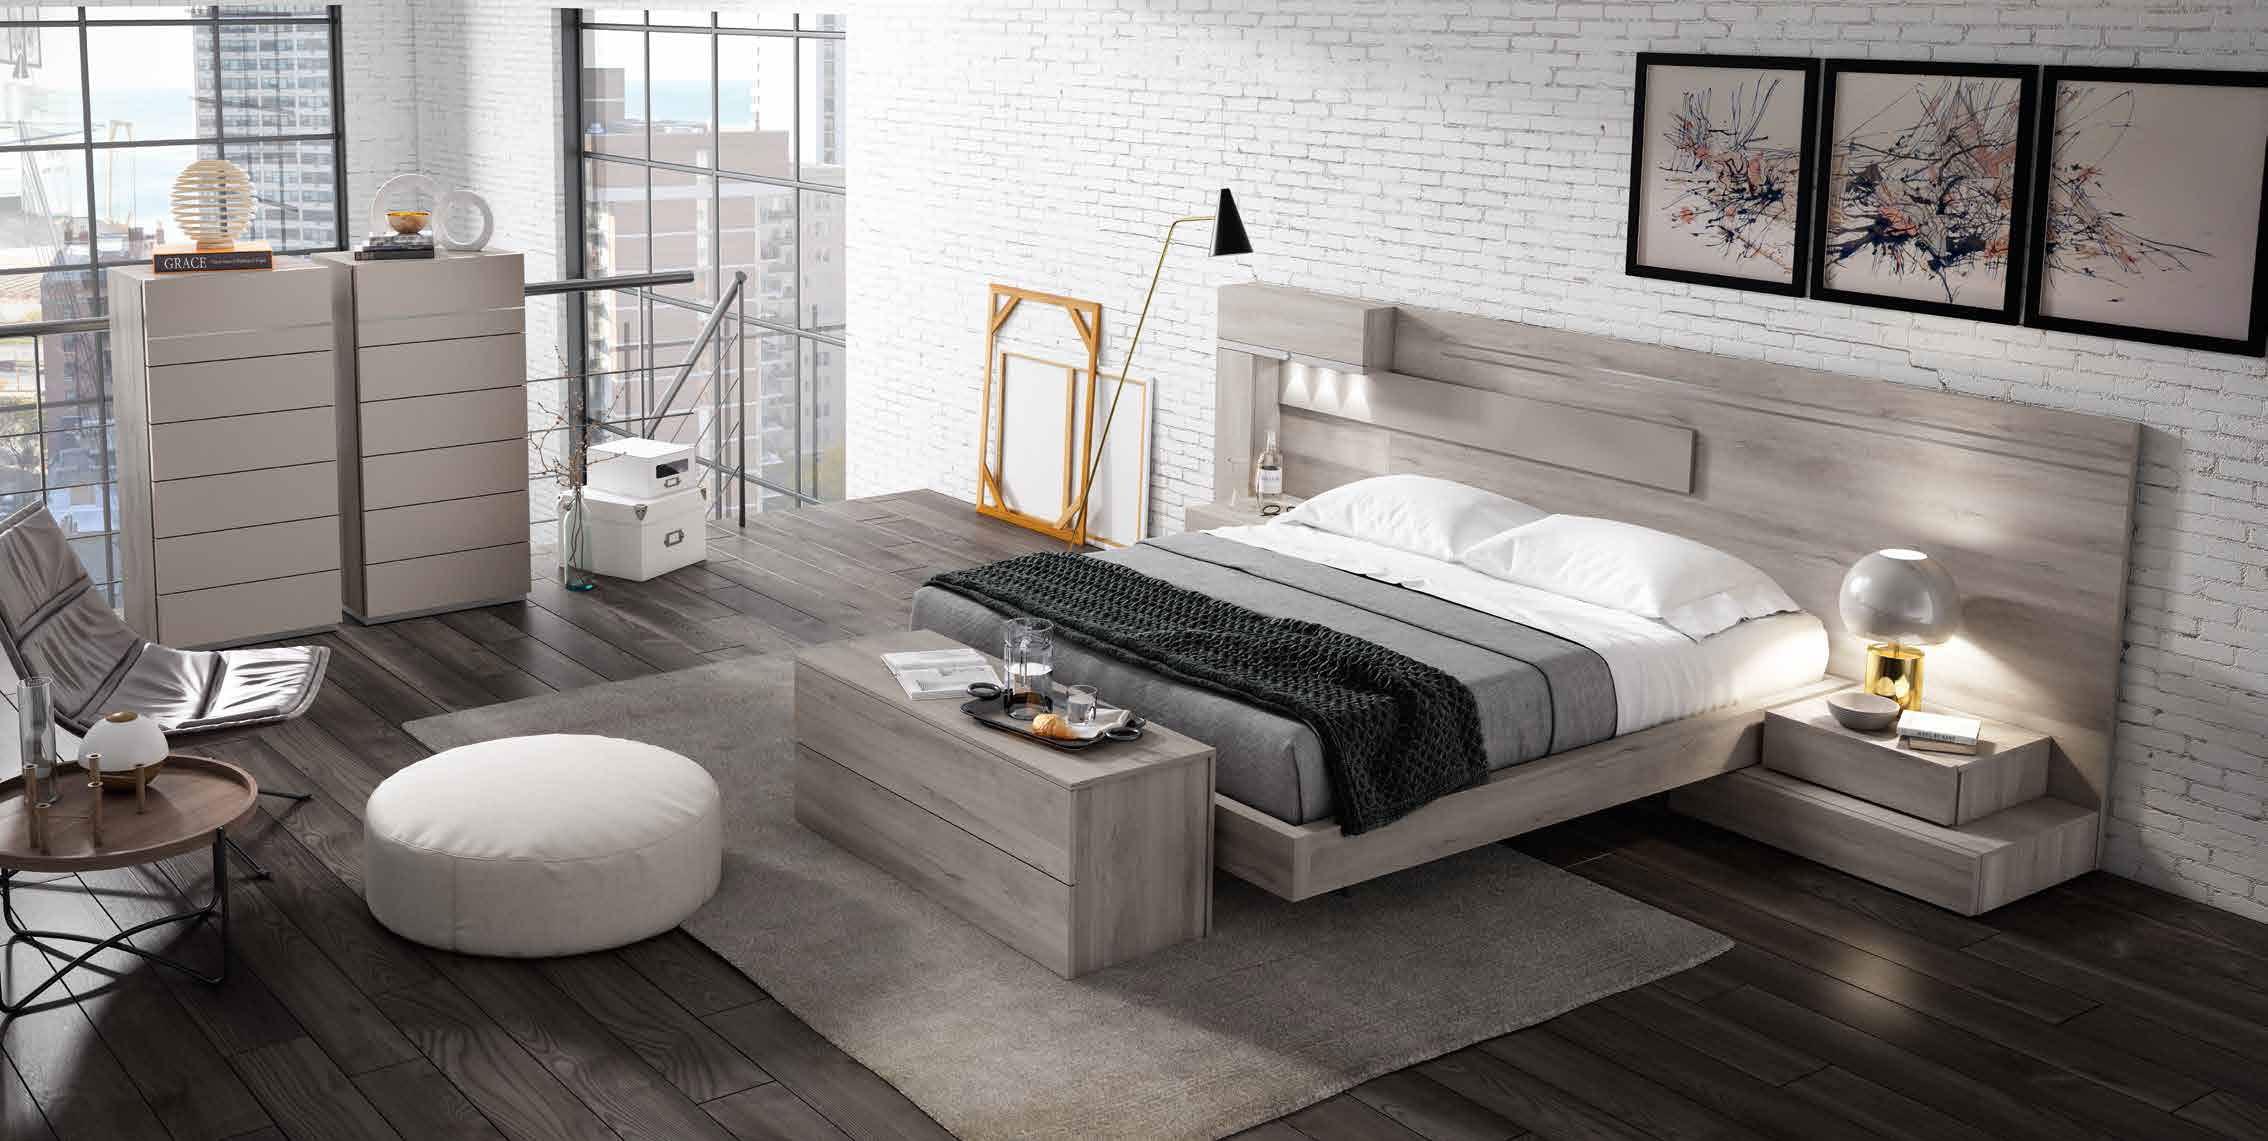 creta-dormitorio-gaia-09